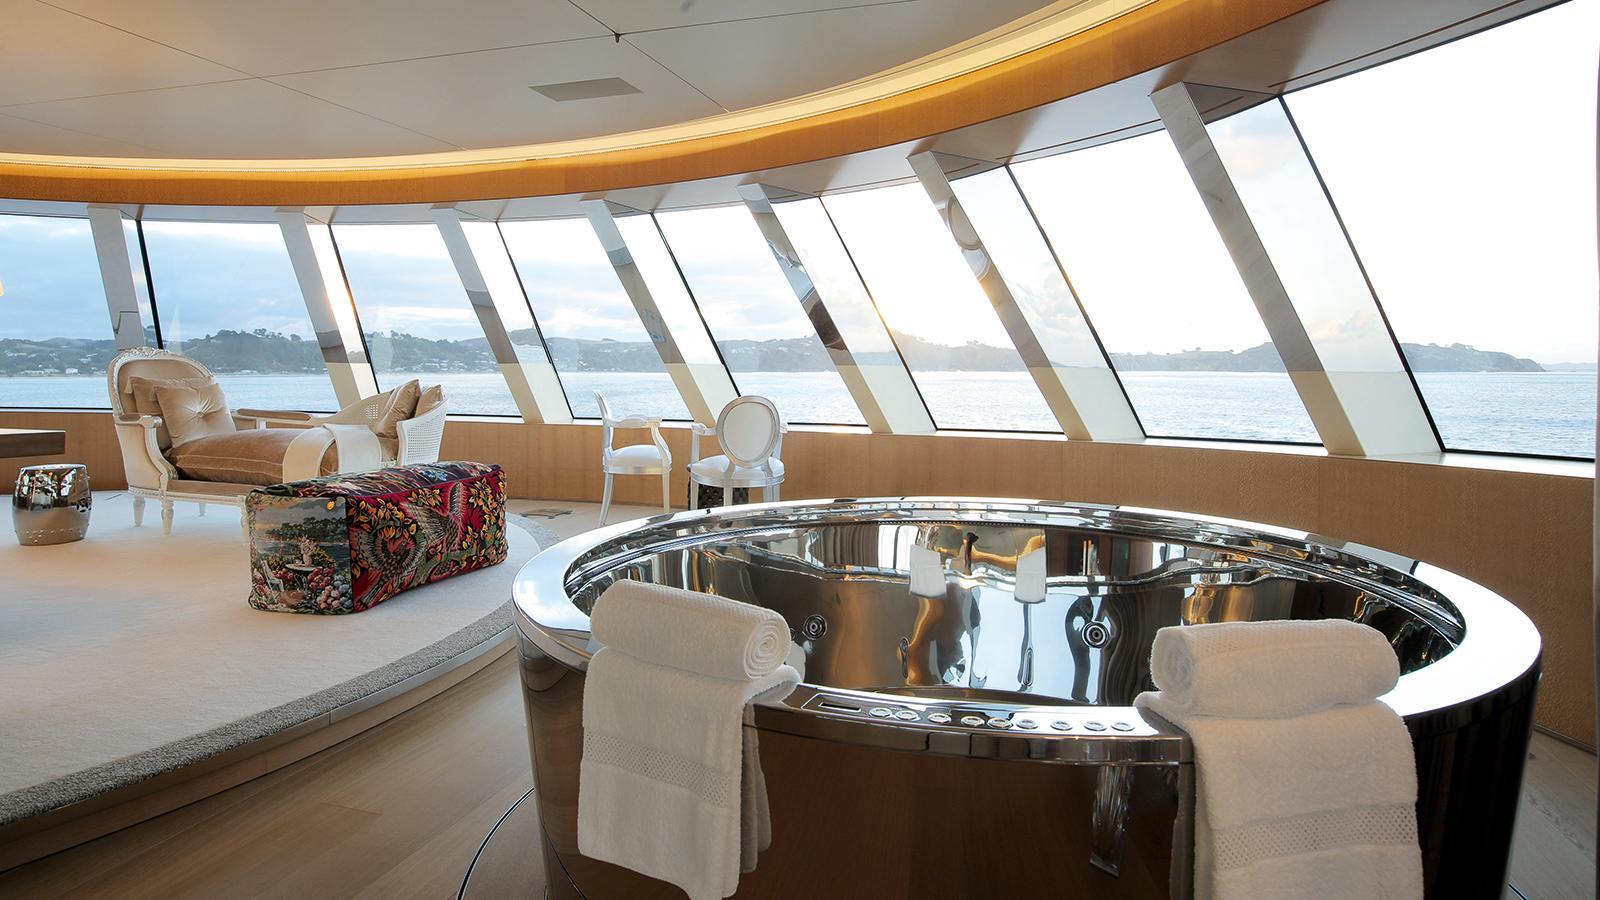 superyacht-a-motor-yacht-blohm-voss-2008-119m-master-detail